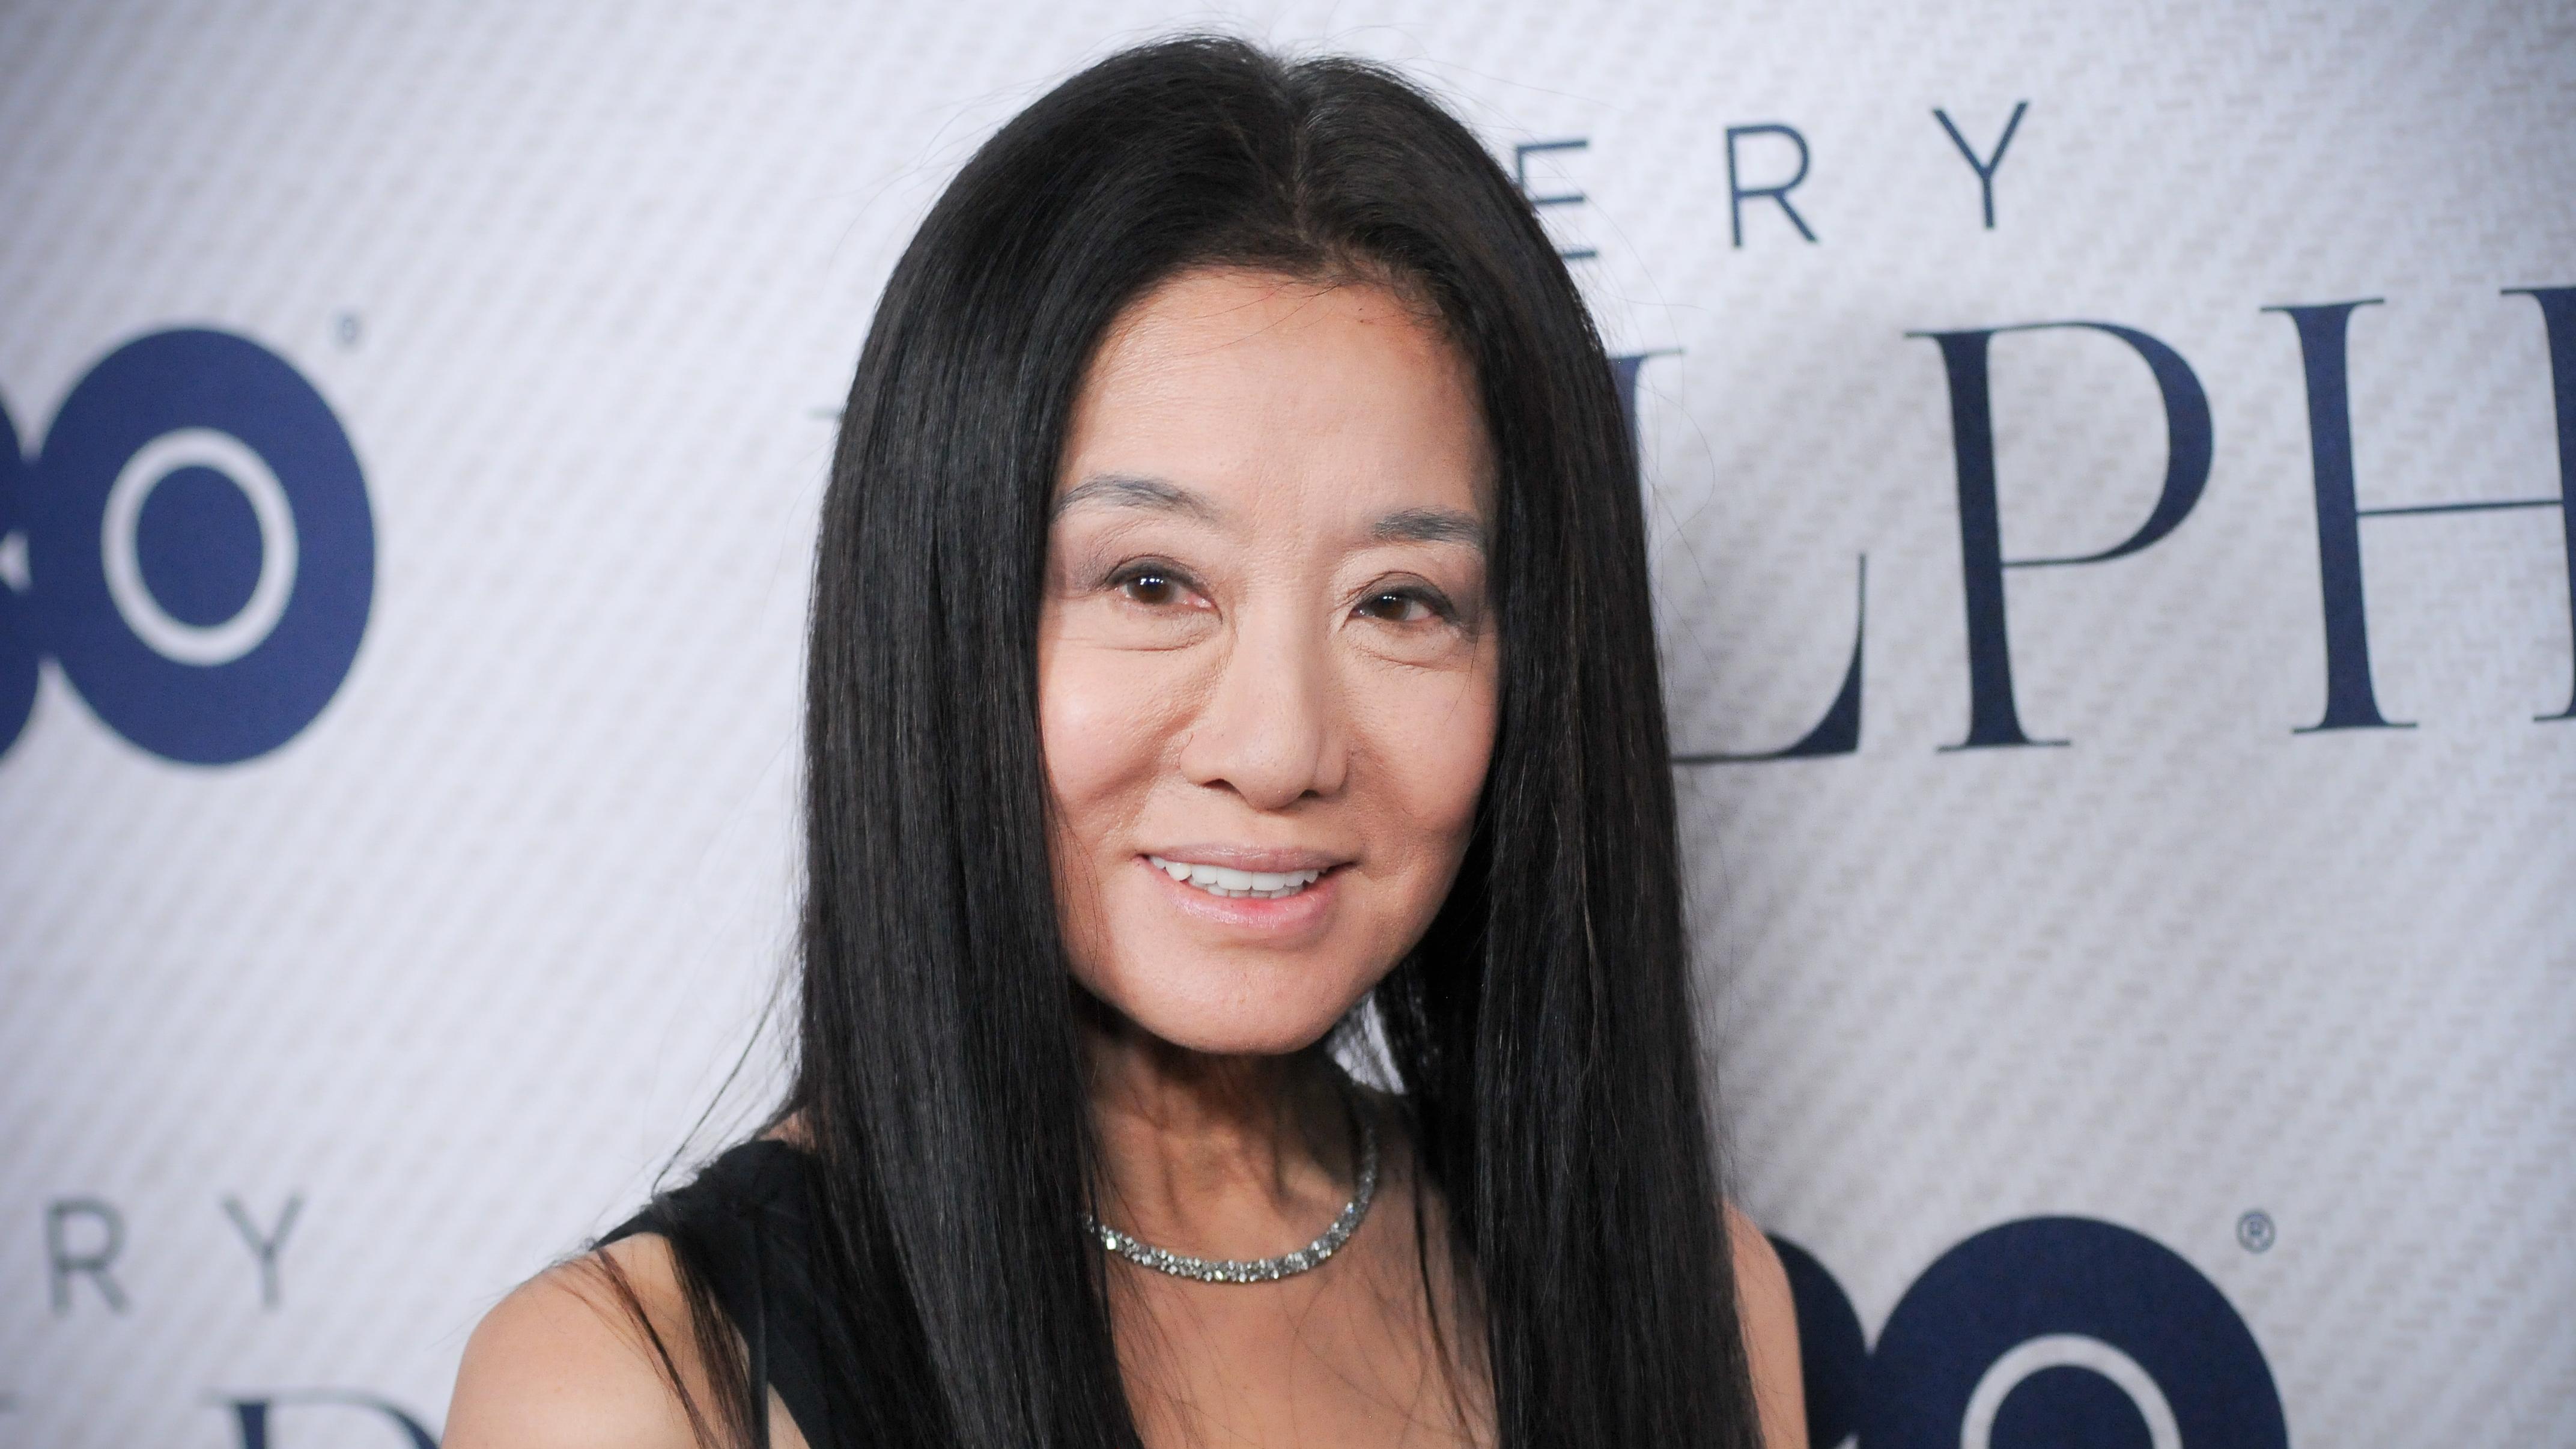 Fashion Designer Vera Wang Confirms She Is 70 Years Old Ladbible